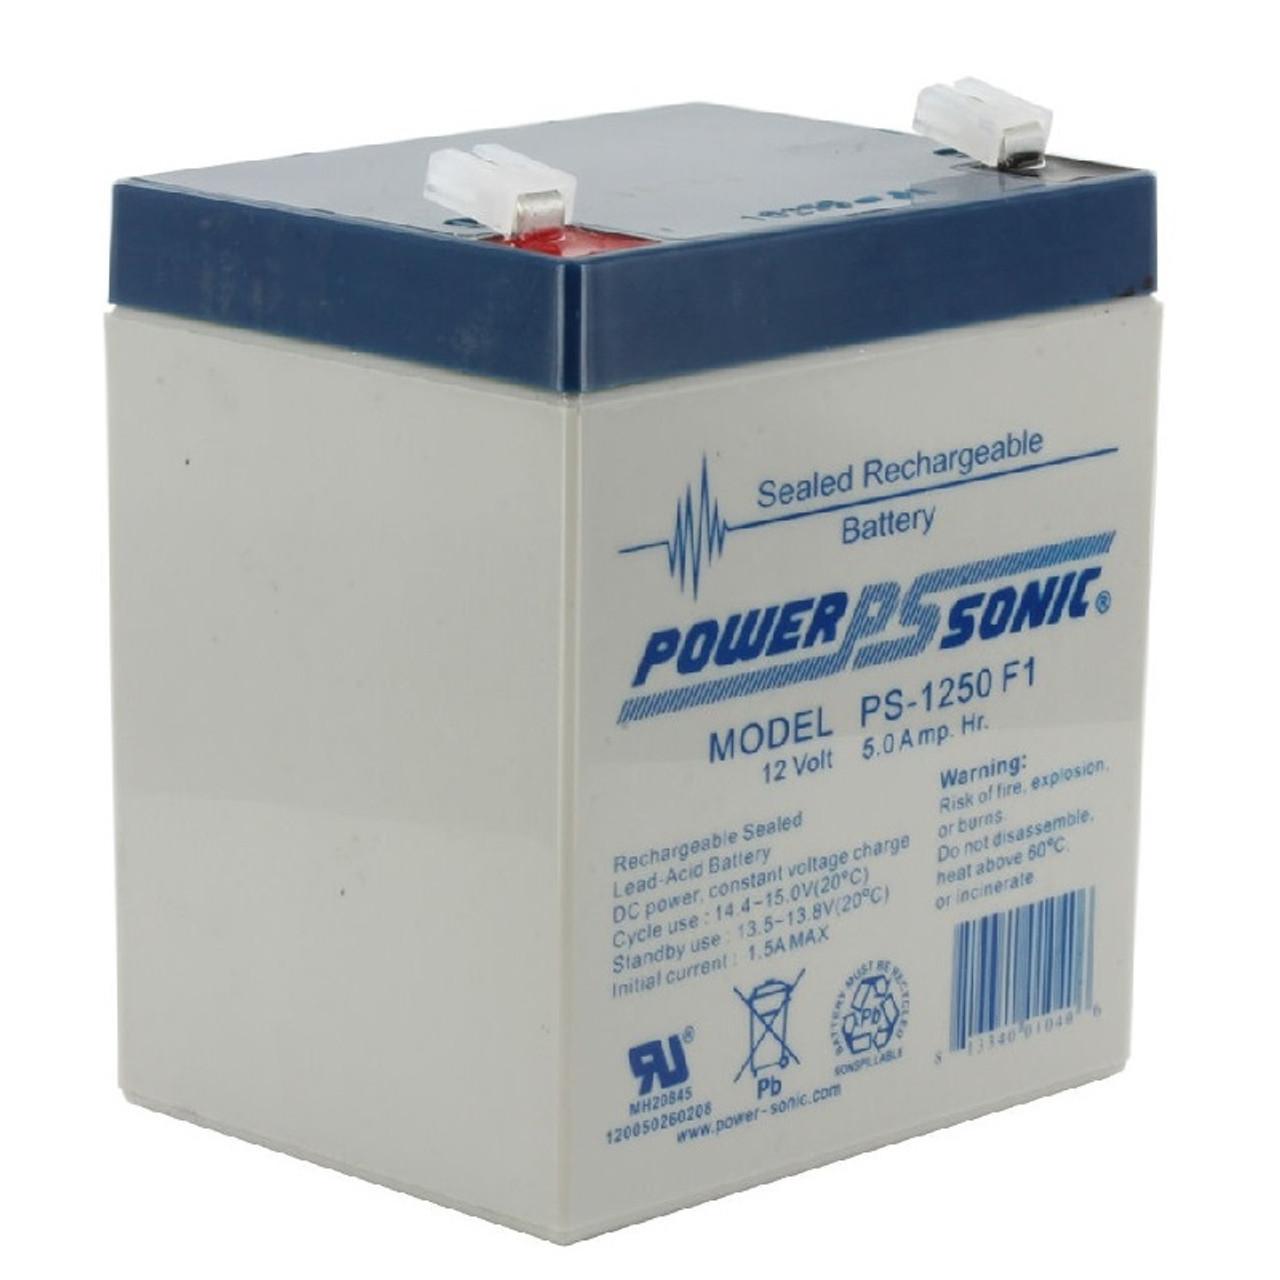 Power Sonic PS-1250F1, 12 Volt, 5AH Rechargeable SLA Battery